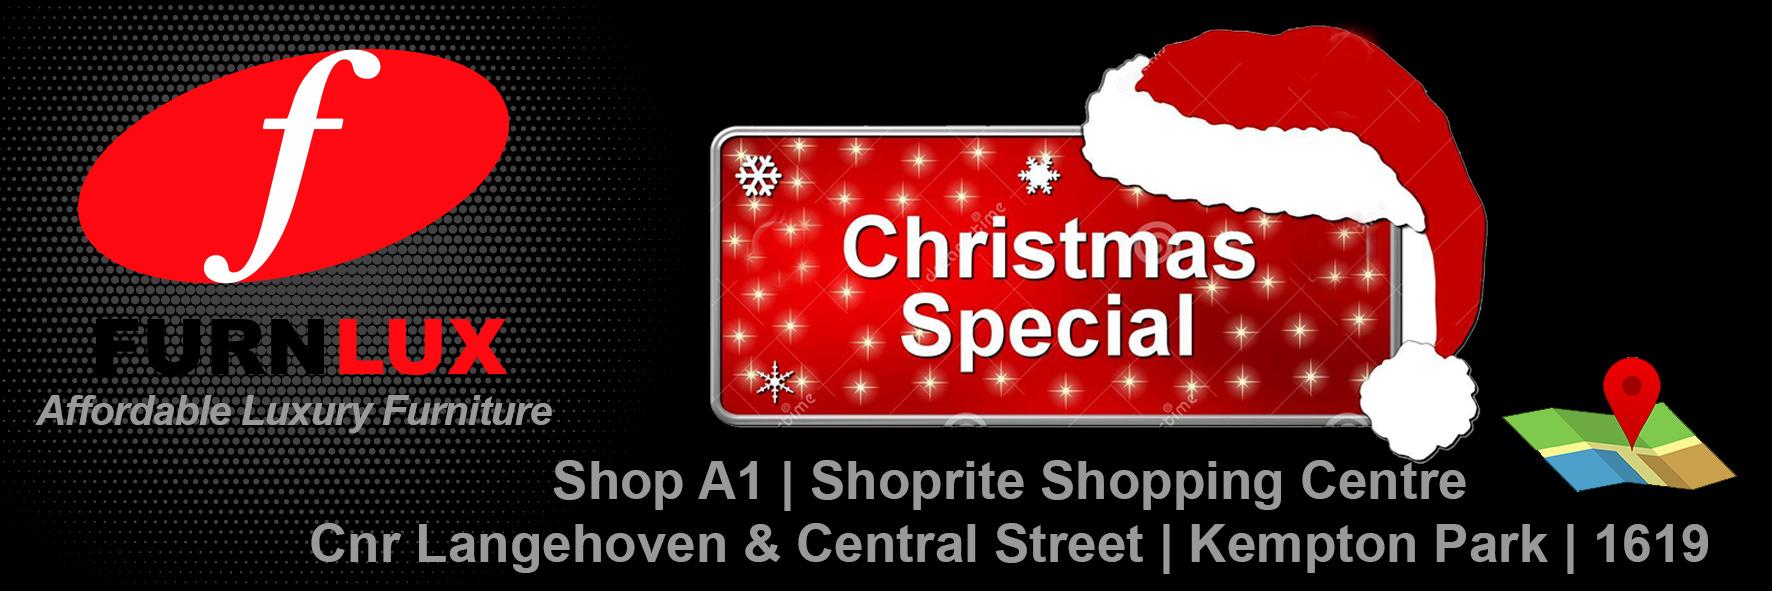 CHRISTMAS SPECIAL BRAND NEW CHESTERFIELD HEADBOARD